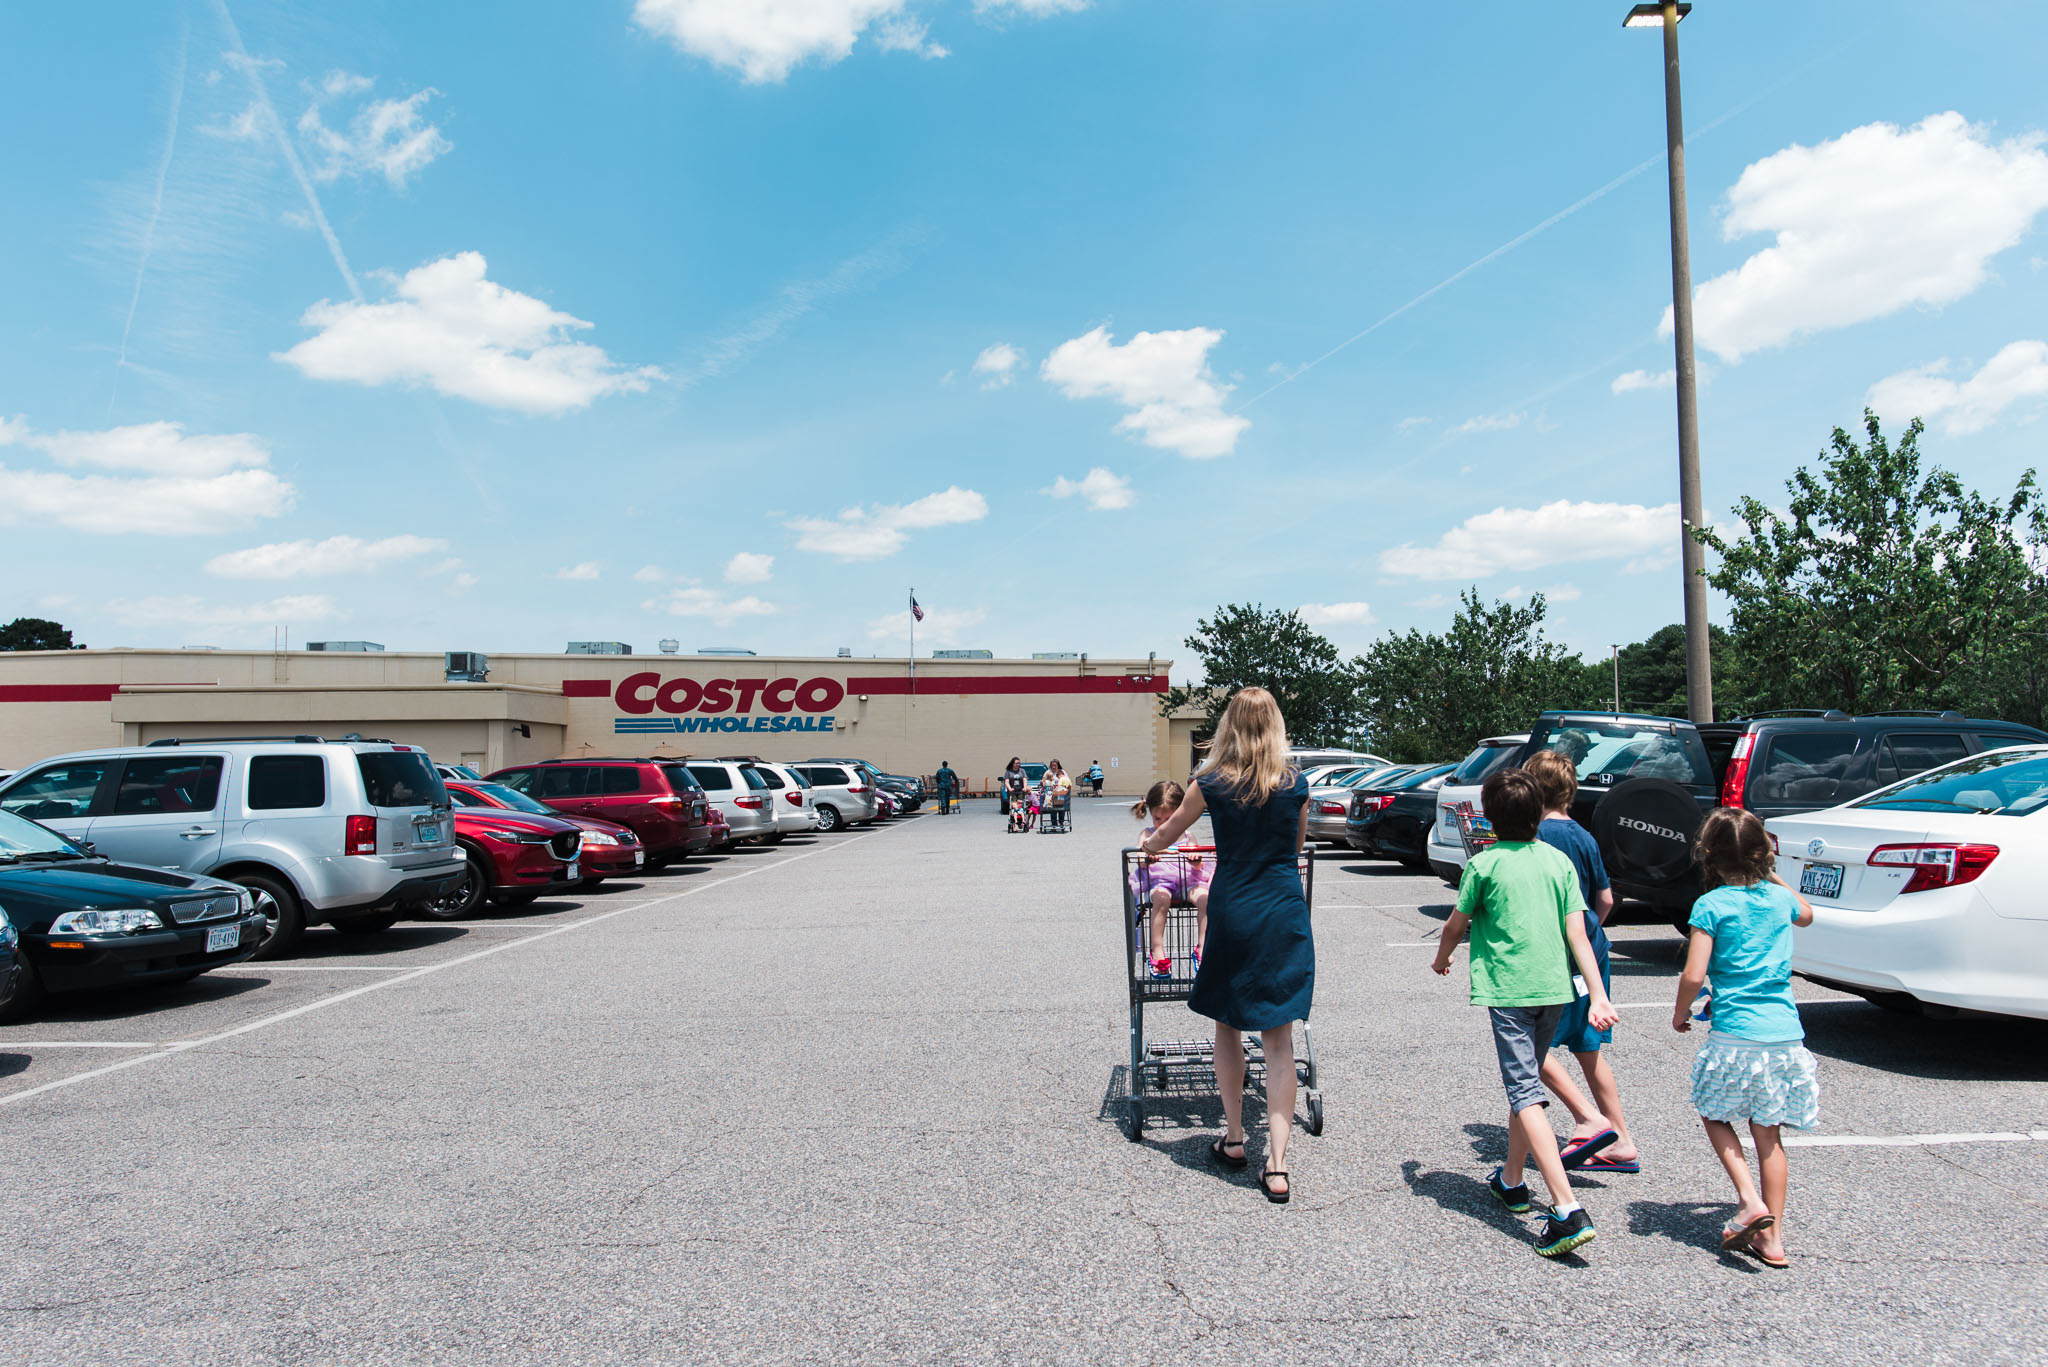 Costco-mom-five-children-blog-4.jpg